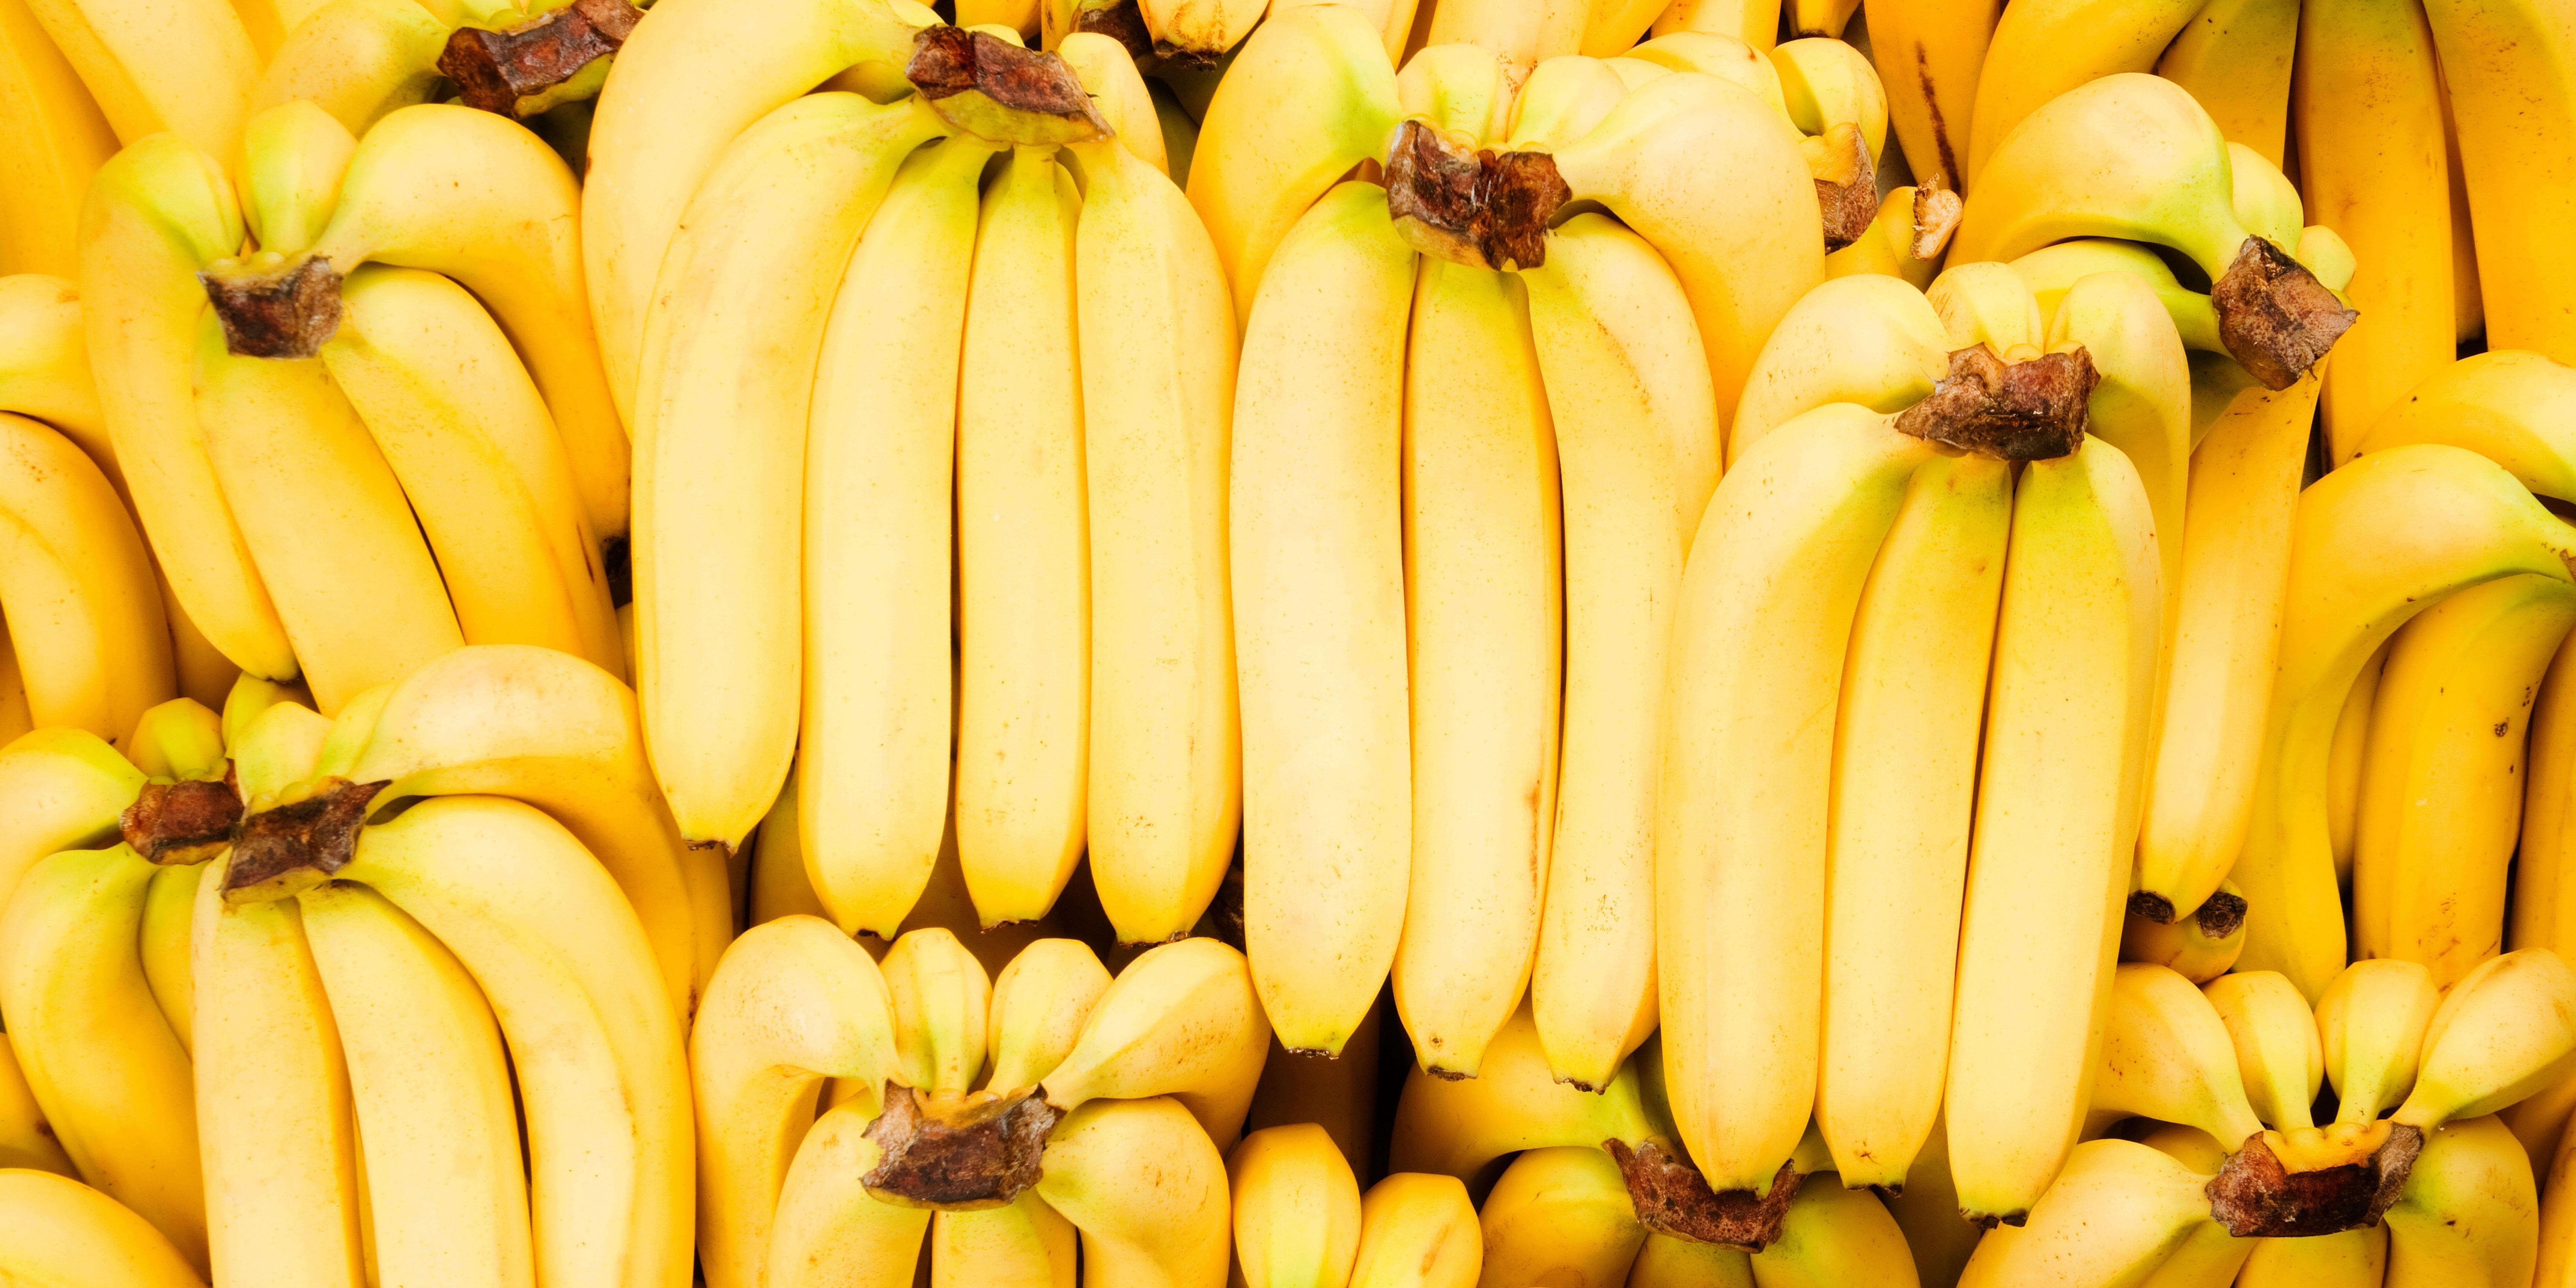 Fresh Bananas being stored